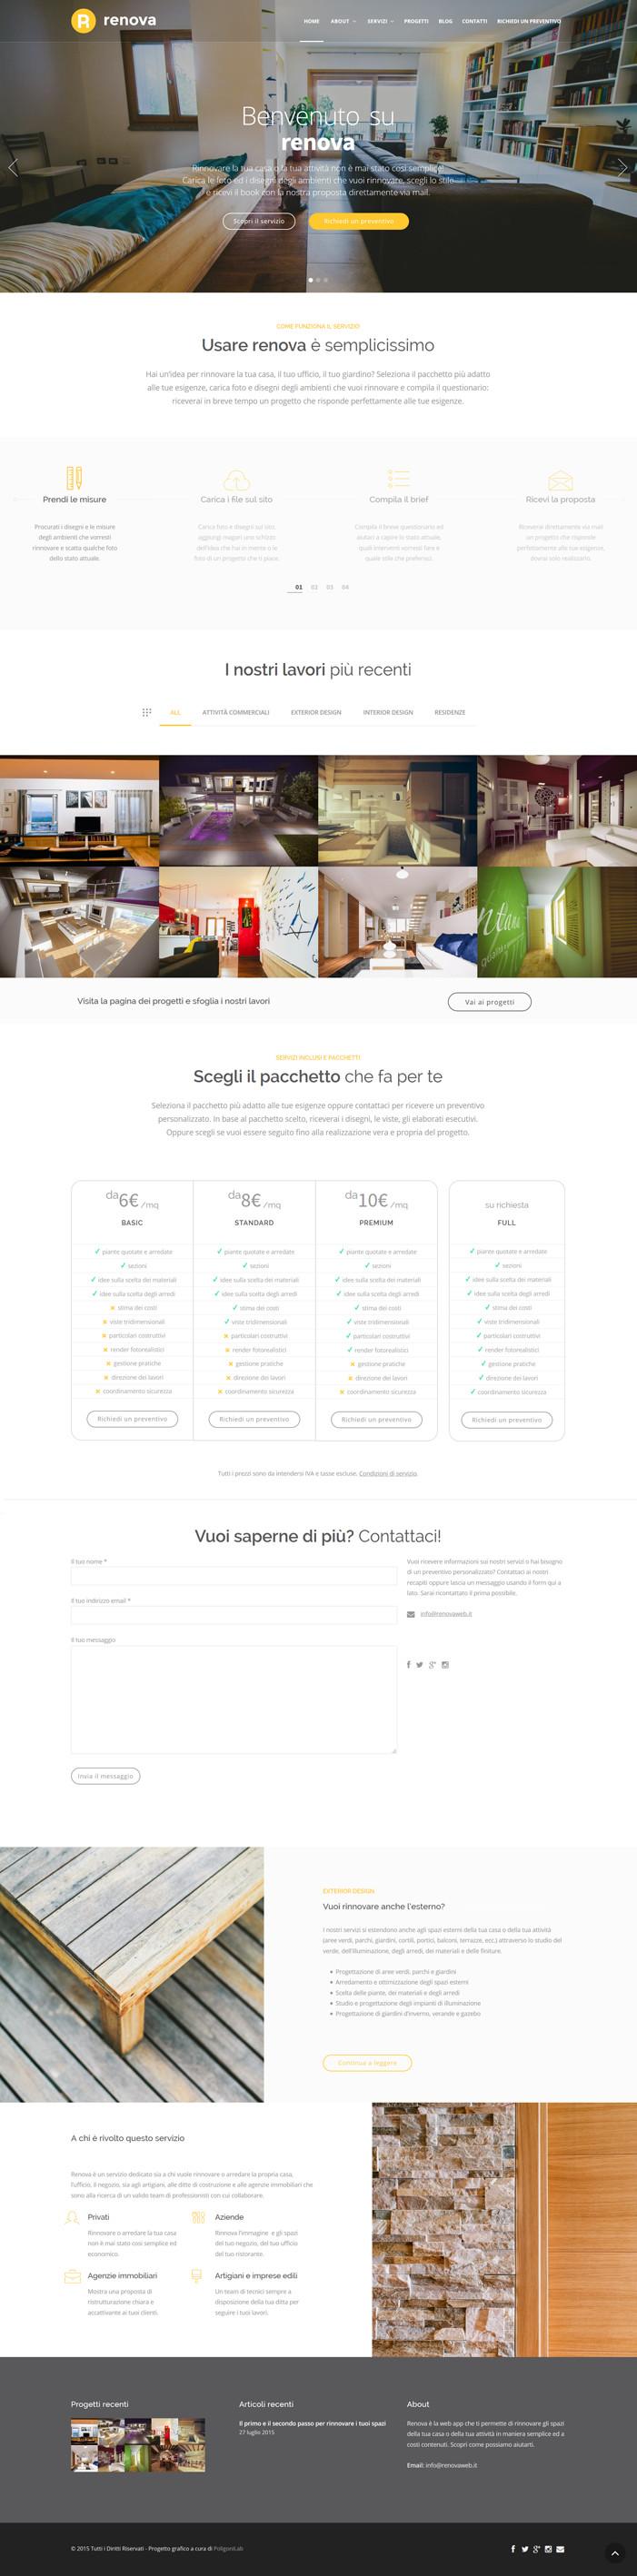 revova website